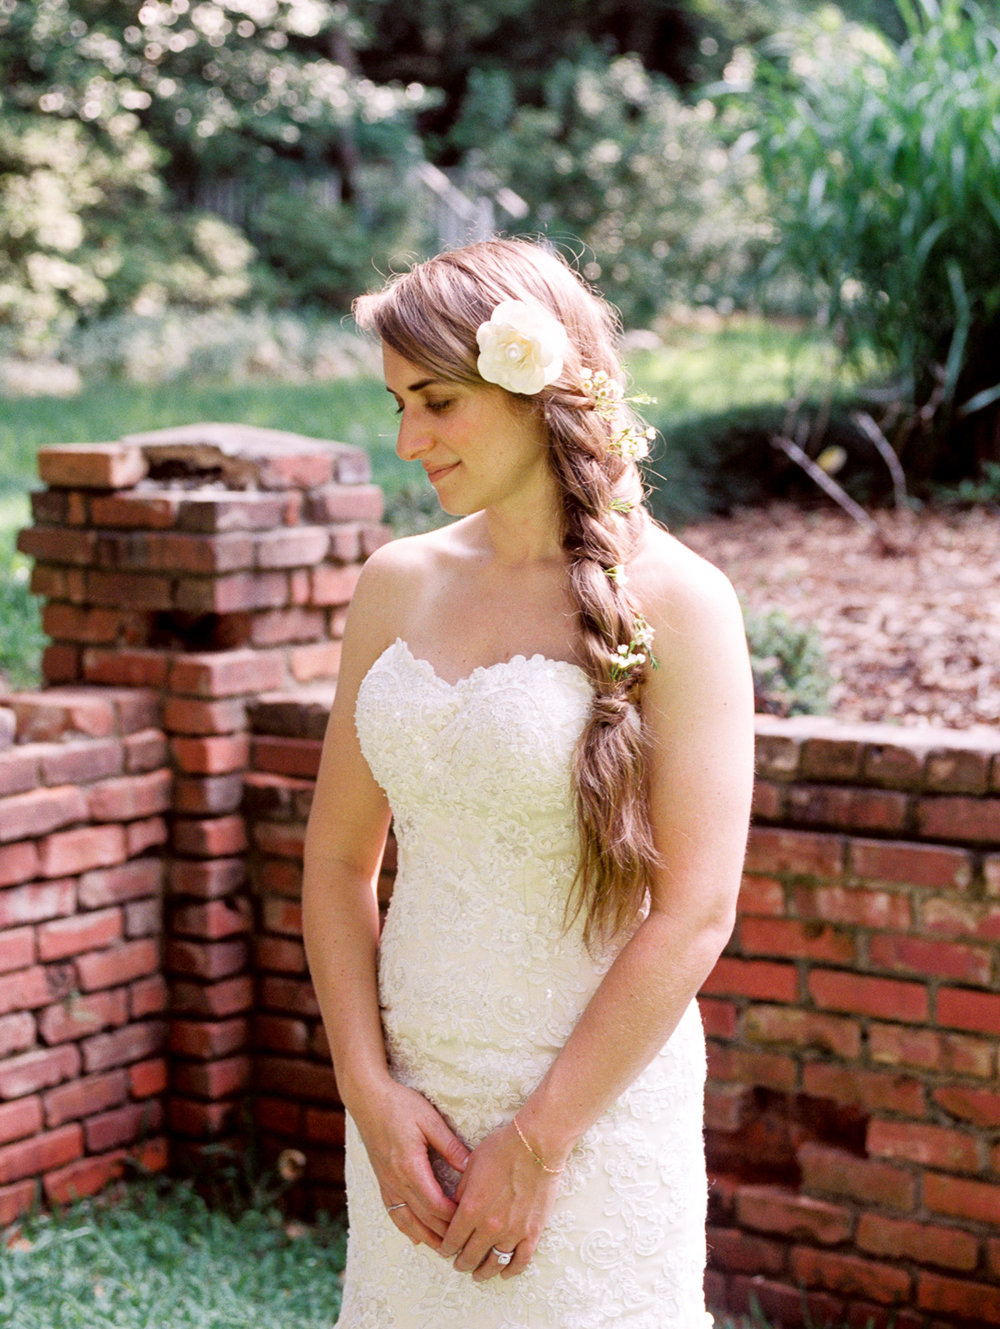 christinadavisphotography-romanticwedding-gardenweddinginspiration04.jpg